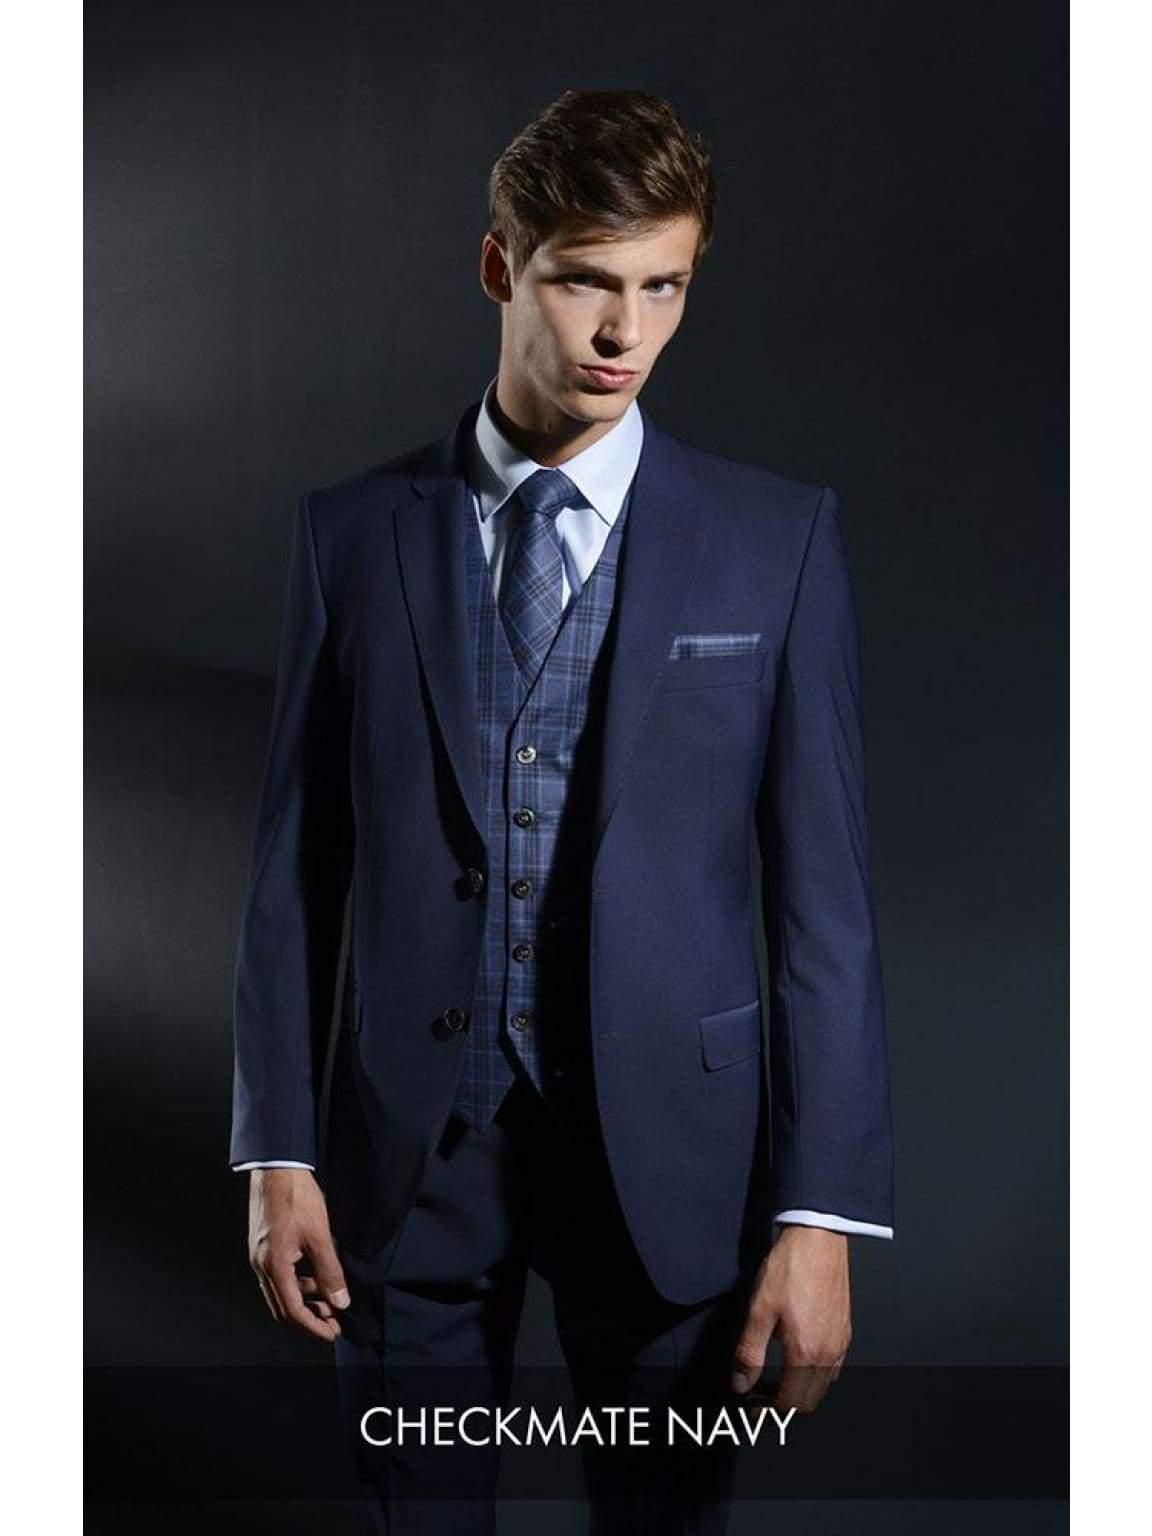 Heirloom Checkmate Mens Navy Luxury Waistcoat - 34R - WAISTCOATS